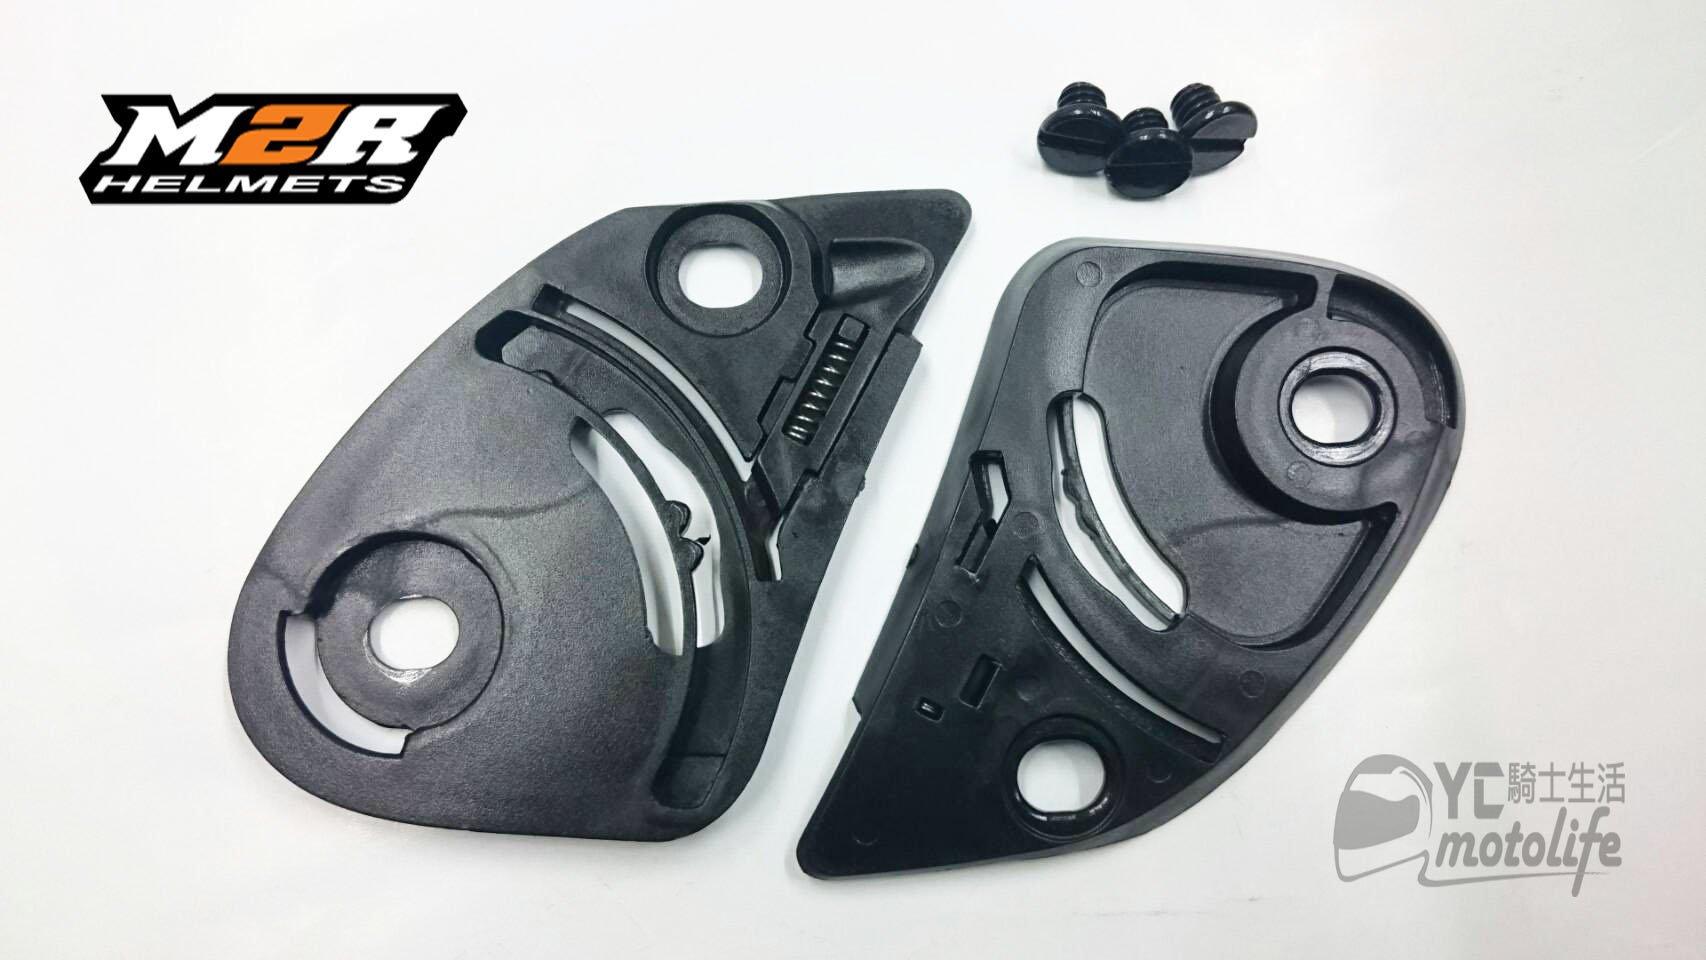 YC騎士生活_M2R F2C OX2 XR3【鏡片座 鏡座】安全帽配件 F2-C OX-2 XR-3 左右一組 含螺絲